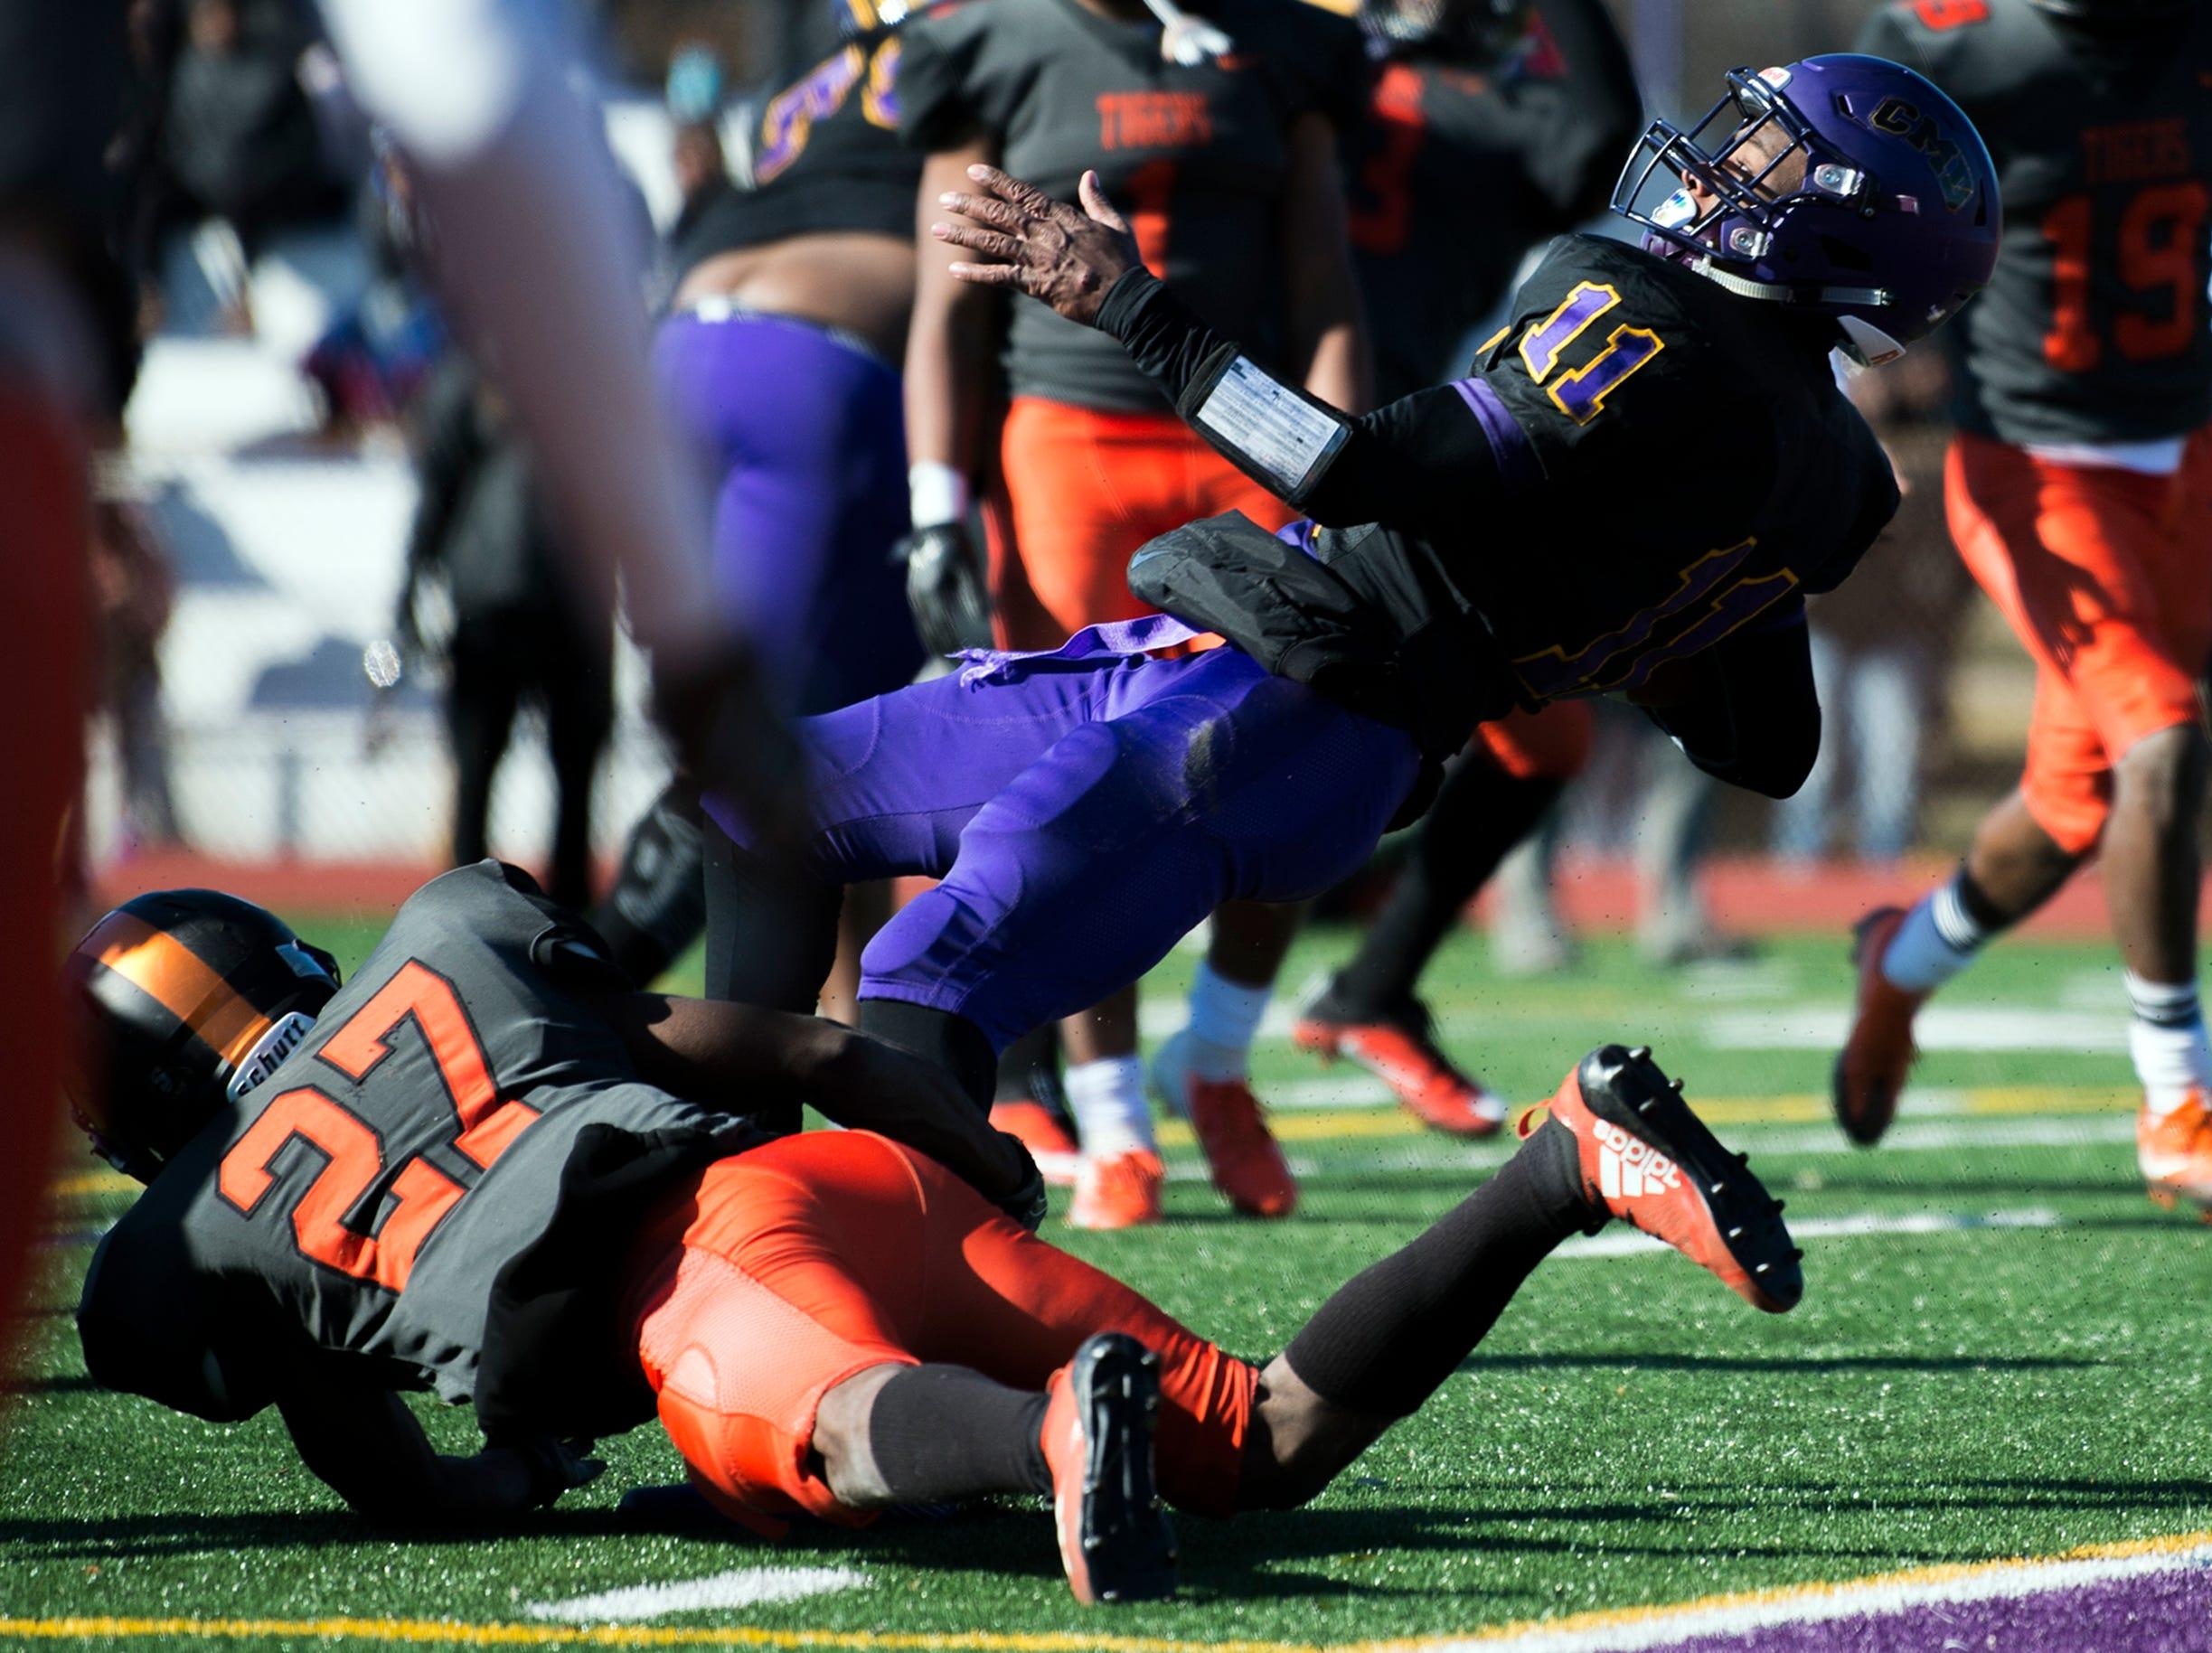 Camden's Monte Williams (11) scores a touchdown during an annual Camden-Woodrow Wilson Thanksgiving game Thursday, Nov. 22, 2018 in Camden, N.J. Camden won 39-28.